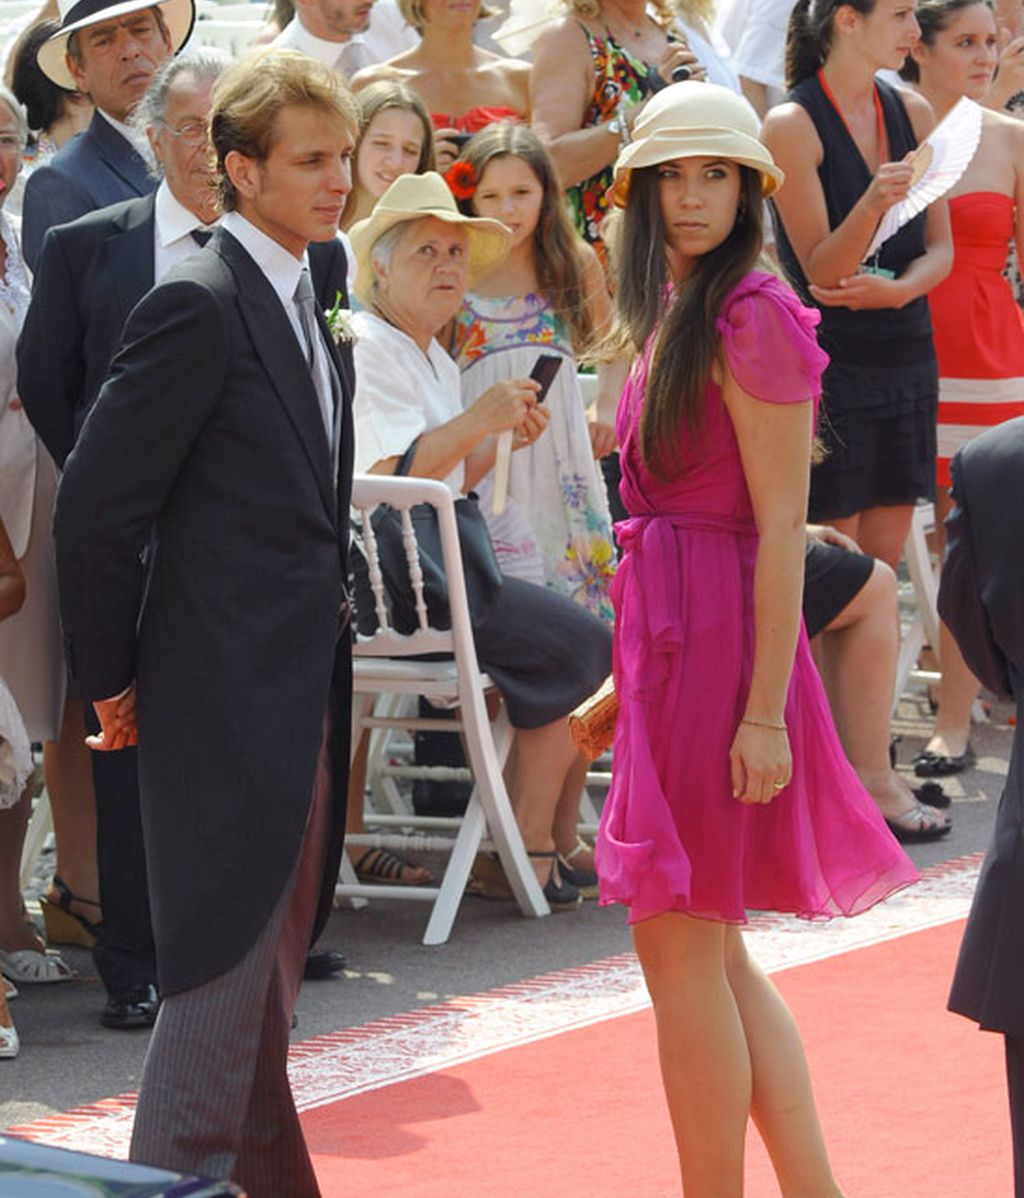 La alfombra roja en Mónaco